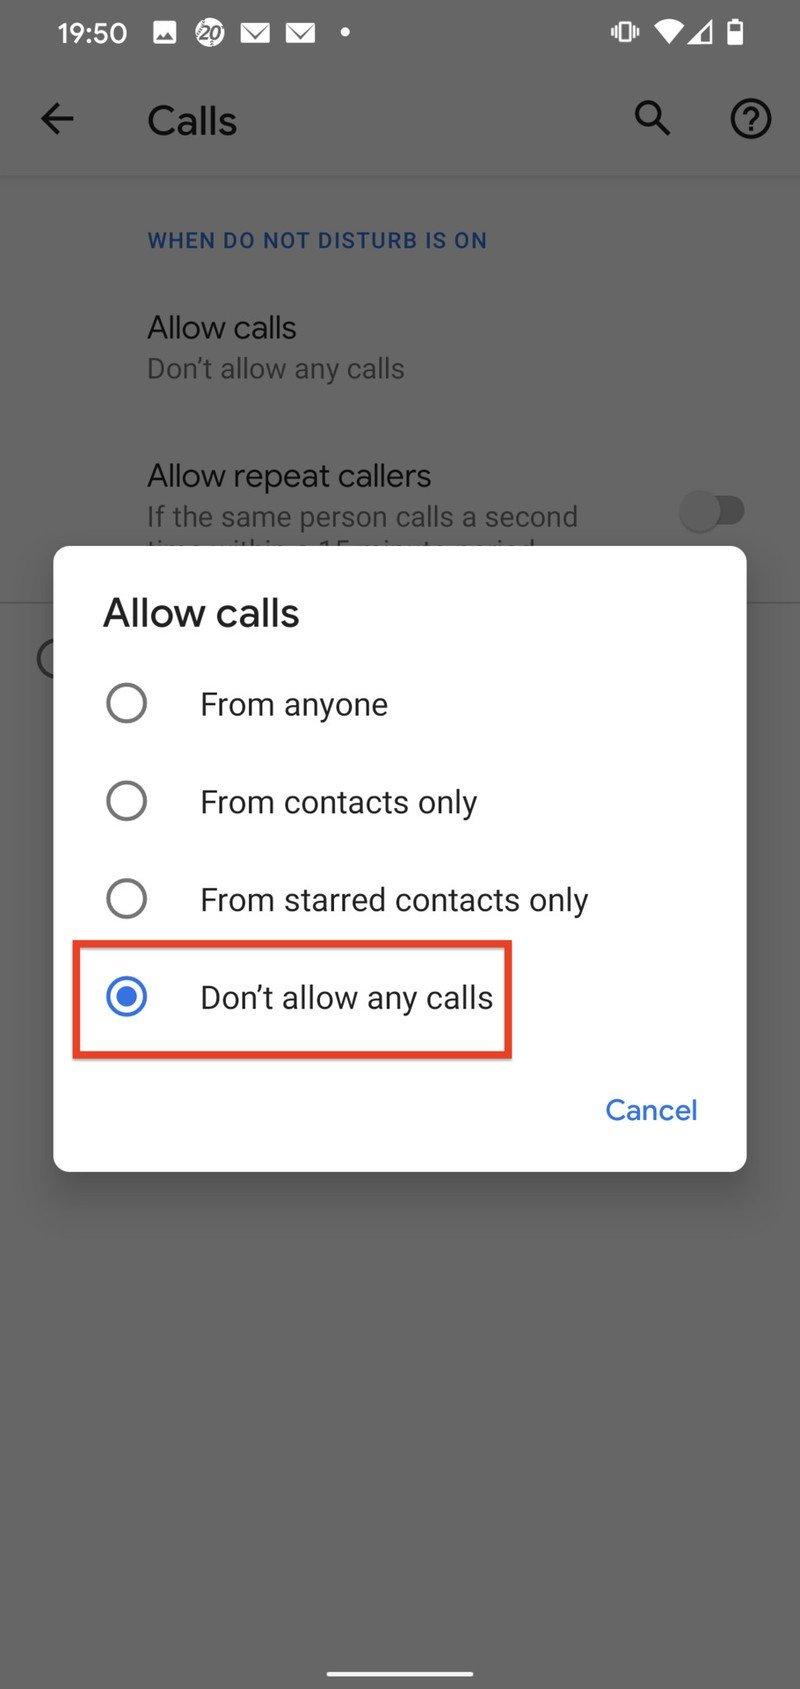 do-not-allow-calls-with-dnd.jpg